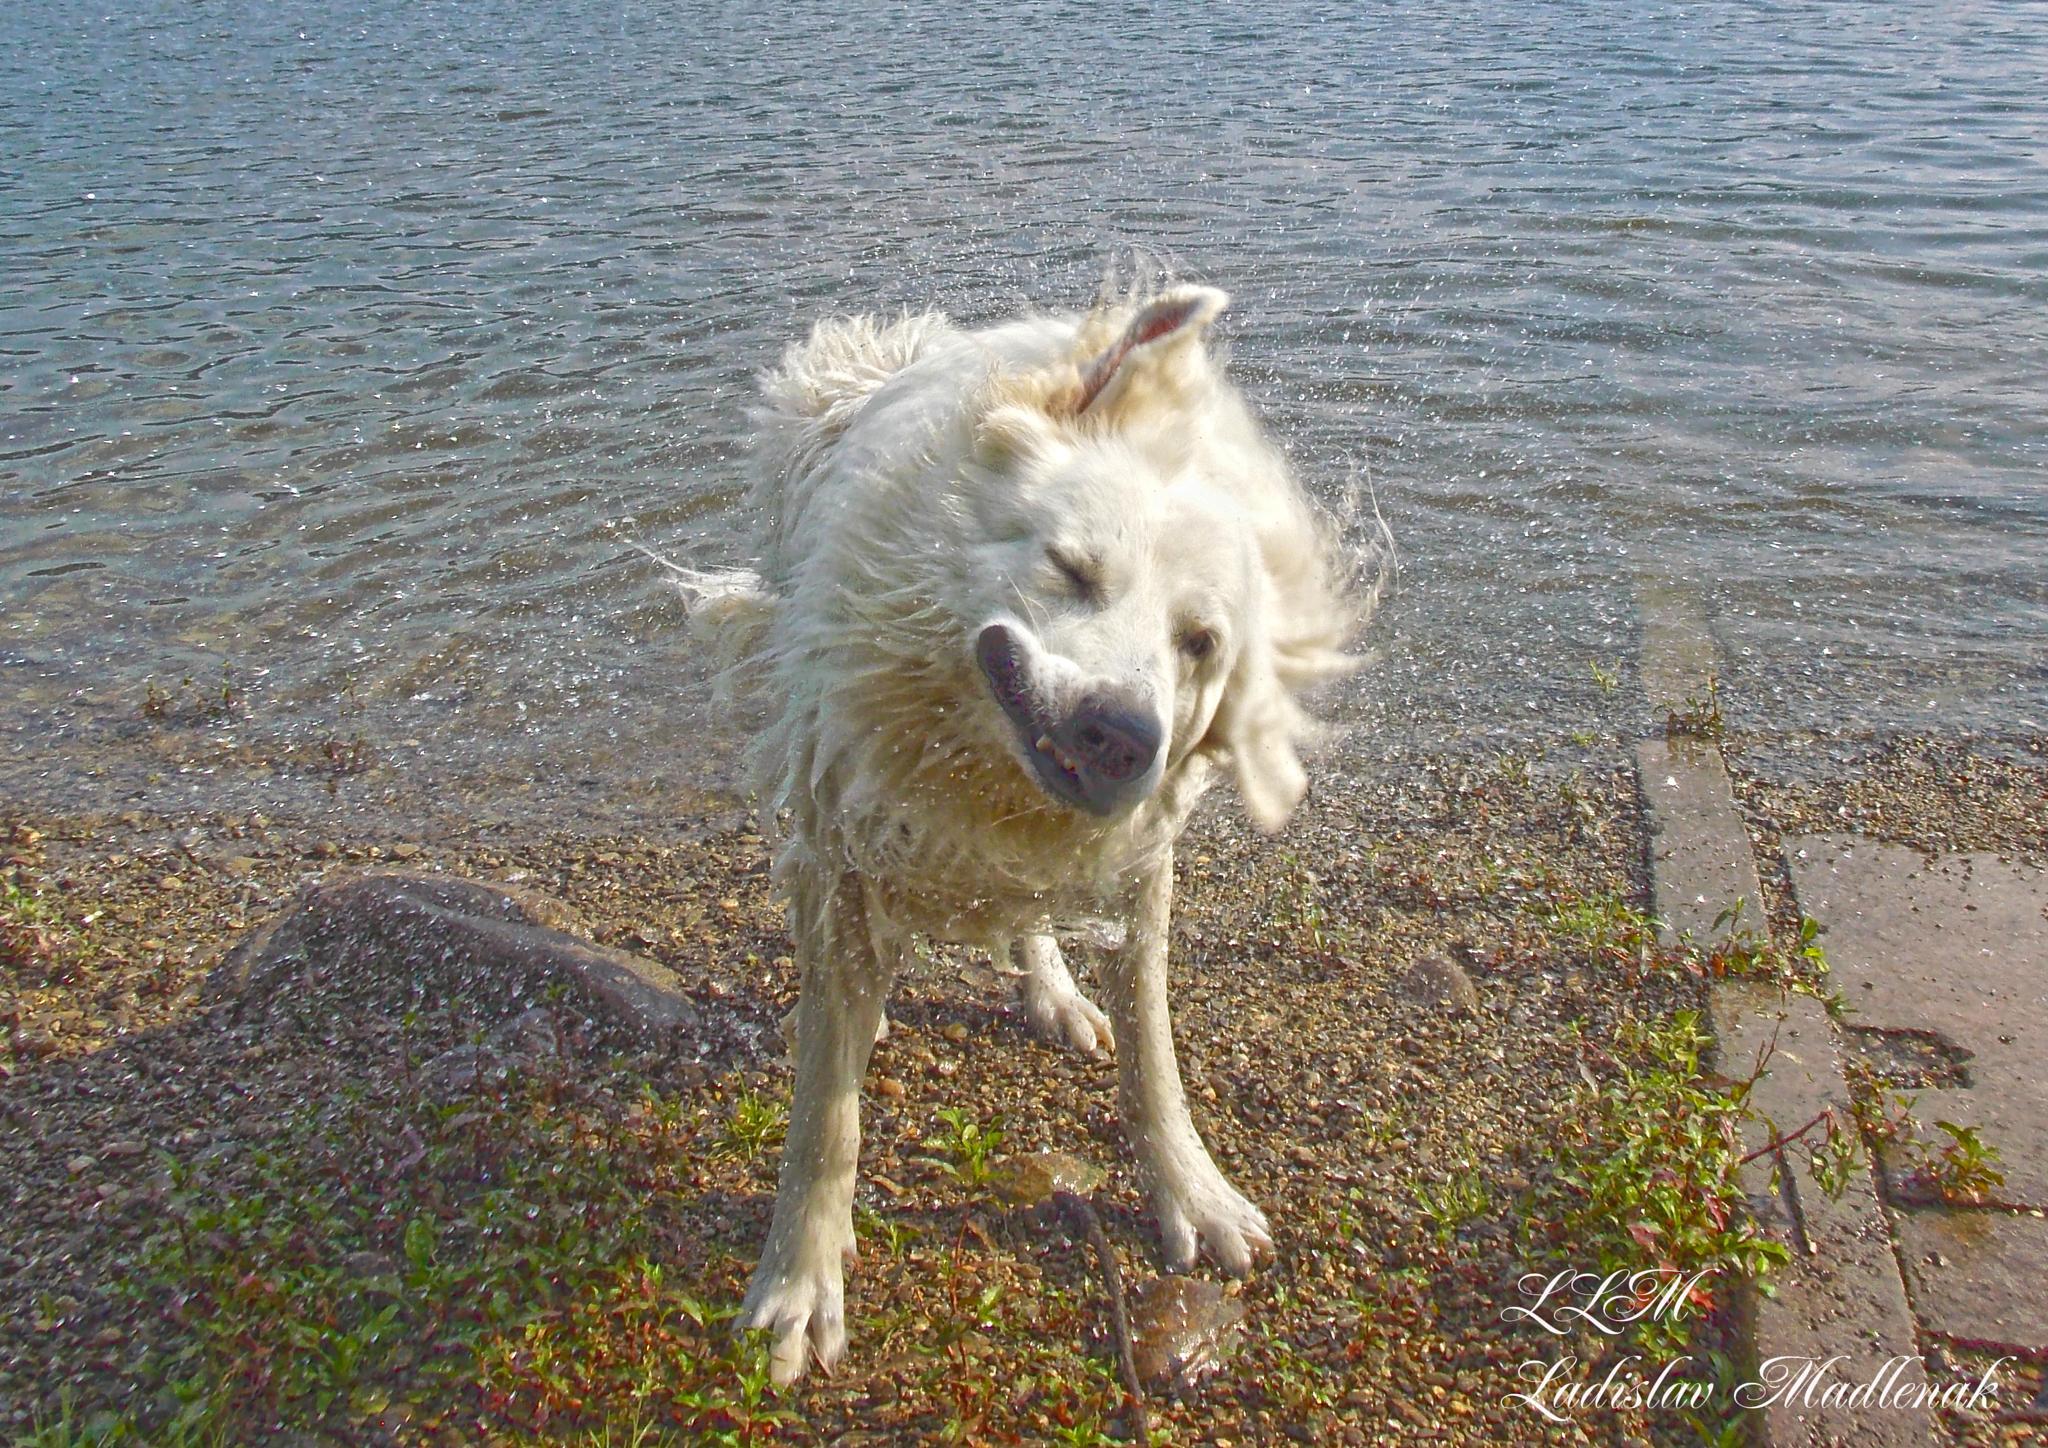 Dog after running around in the water by LLadislav Madlenak